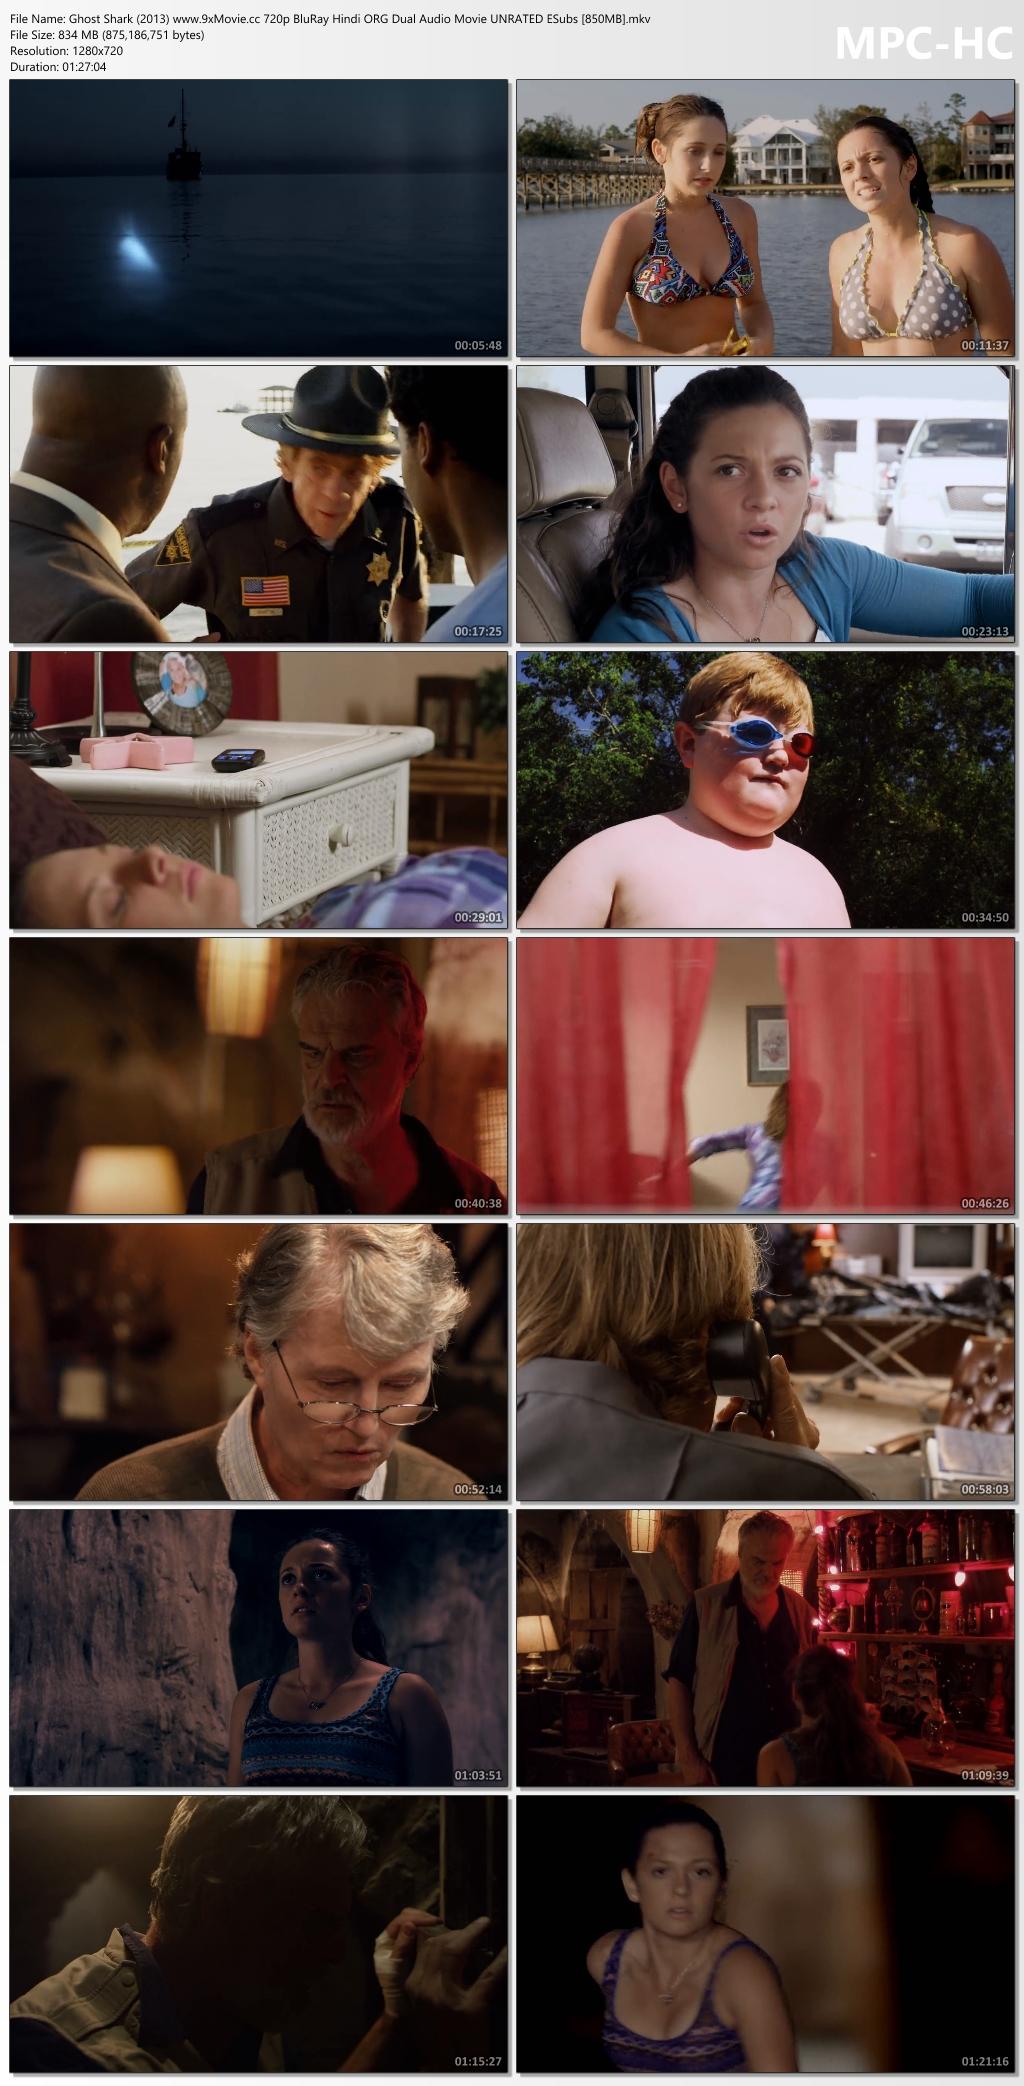 Ghost-Shark-2013-www-9x-Movie-cc-720p-Blu-Ray-Hindi-ORG-Dual-Audio-Movie-UNRATED-ESubs-850-MB-mkv